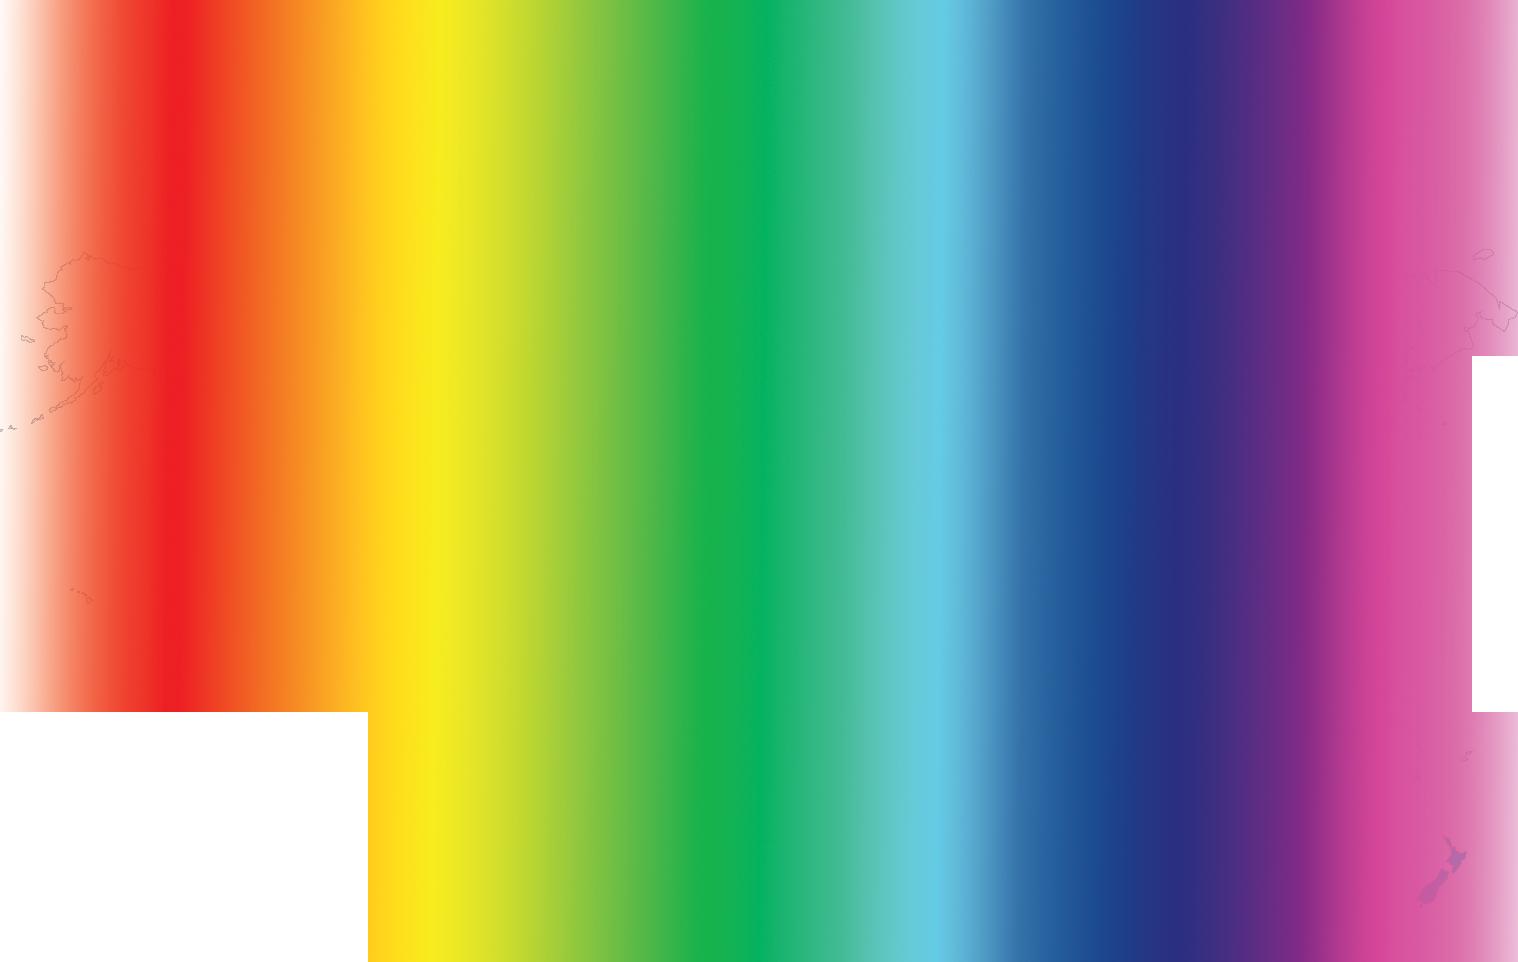 Rainbow map of the world